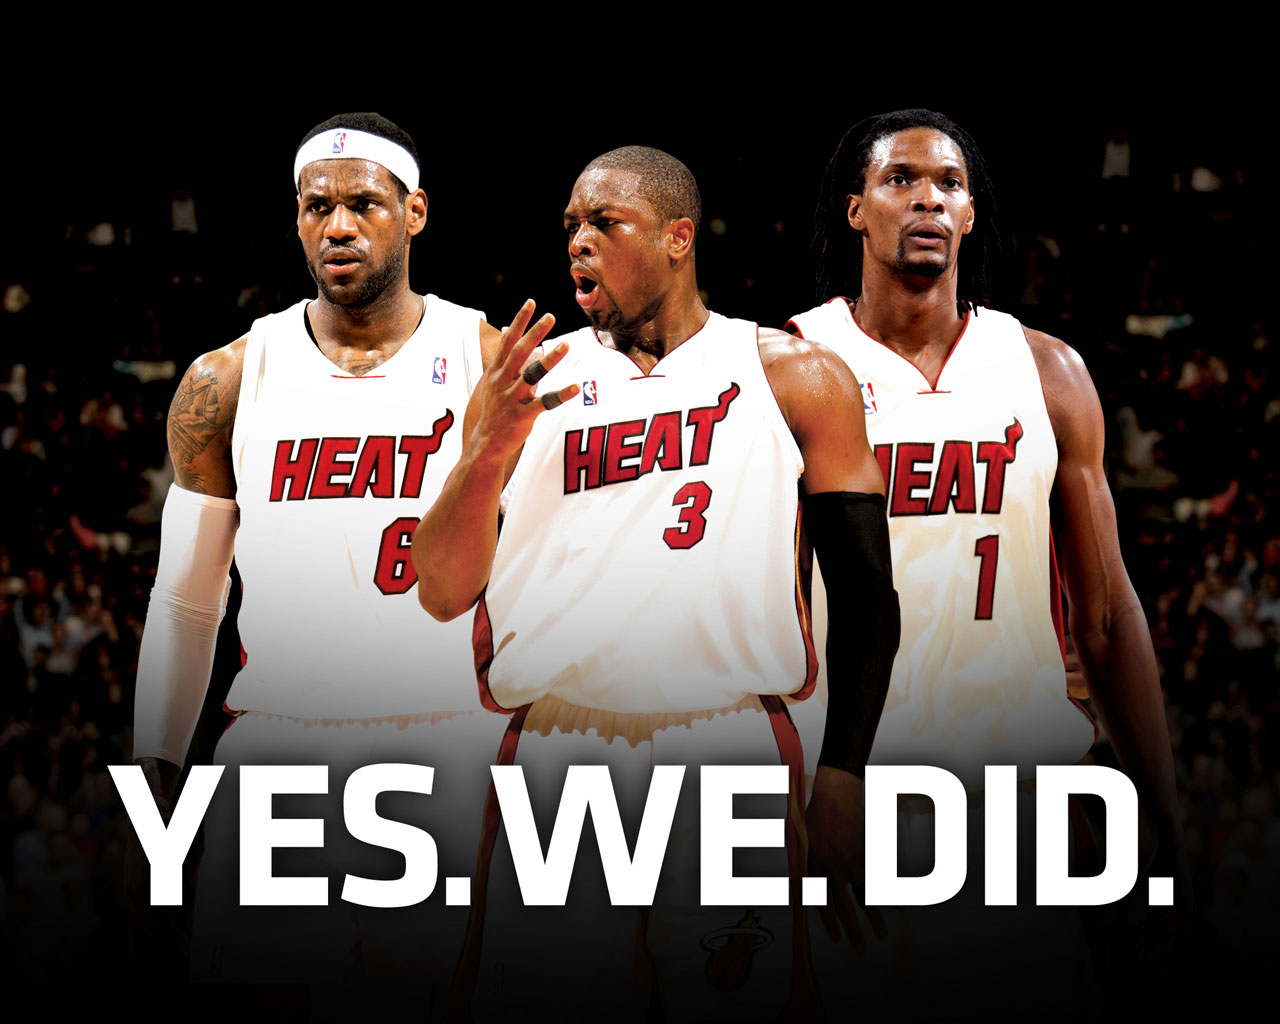 Nba Basketball Miami Heat Bedroom In: The Shootin Starz: HEAT 2012 NBA CHAMPS